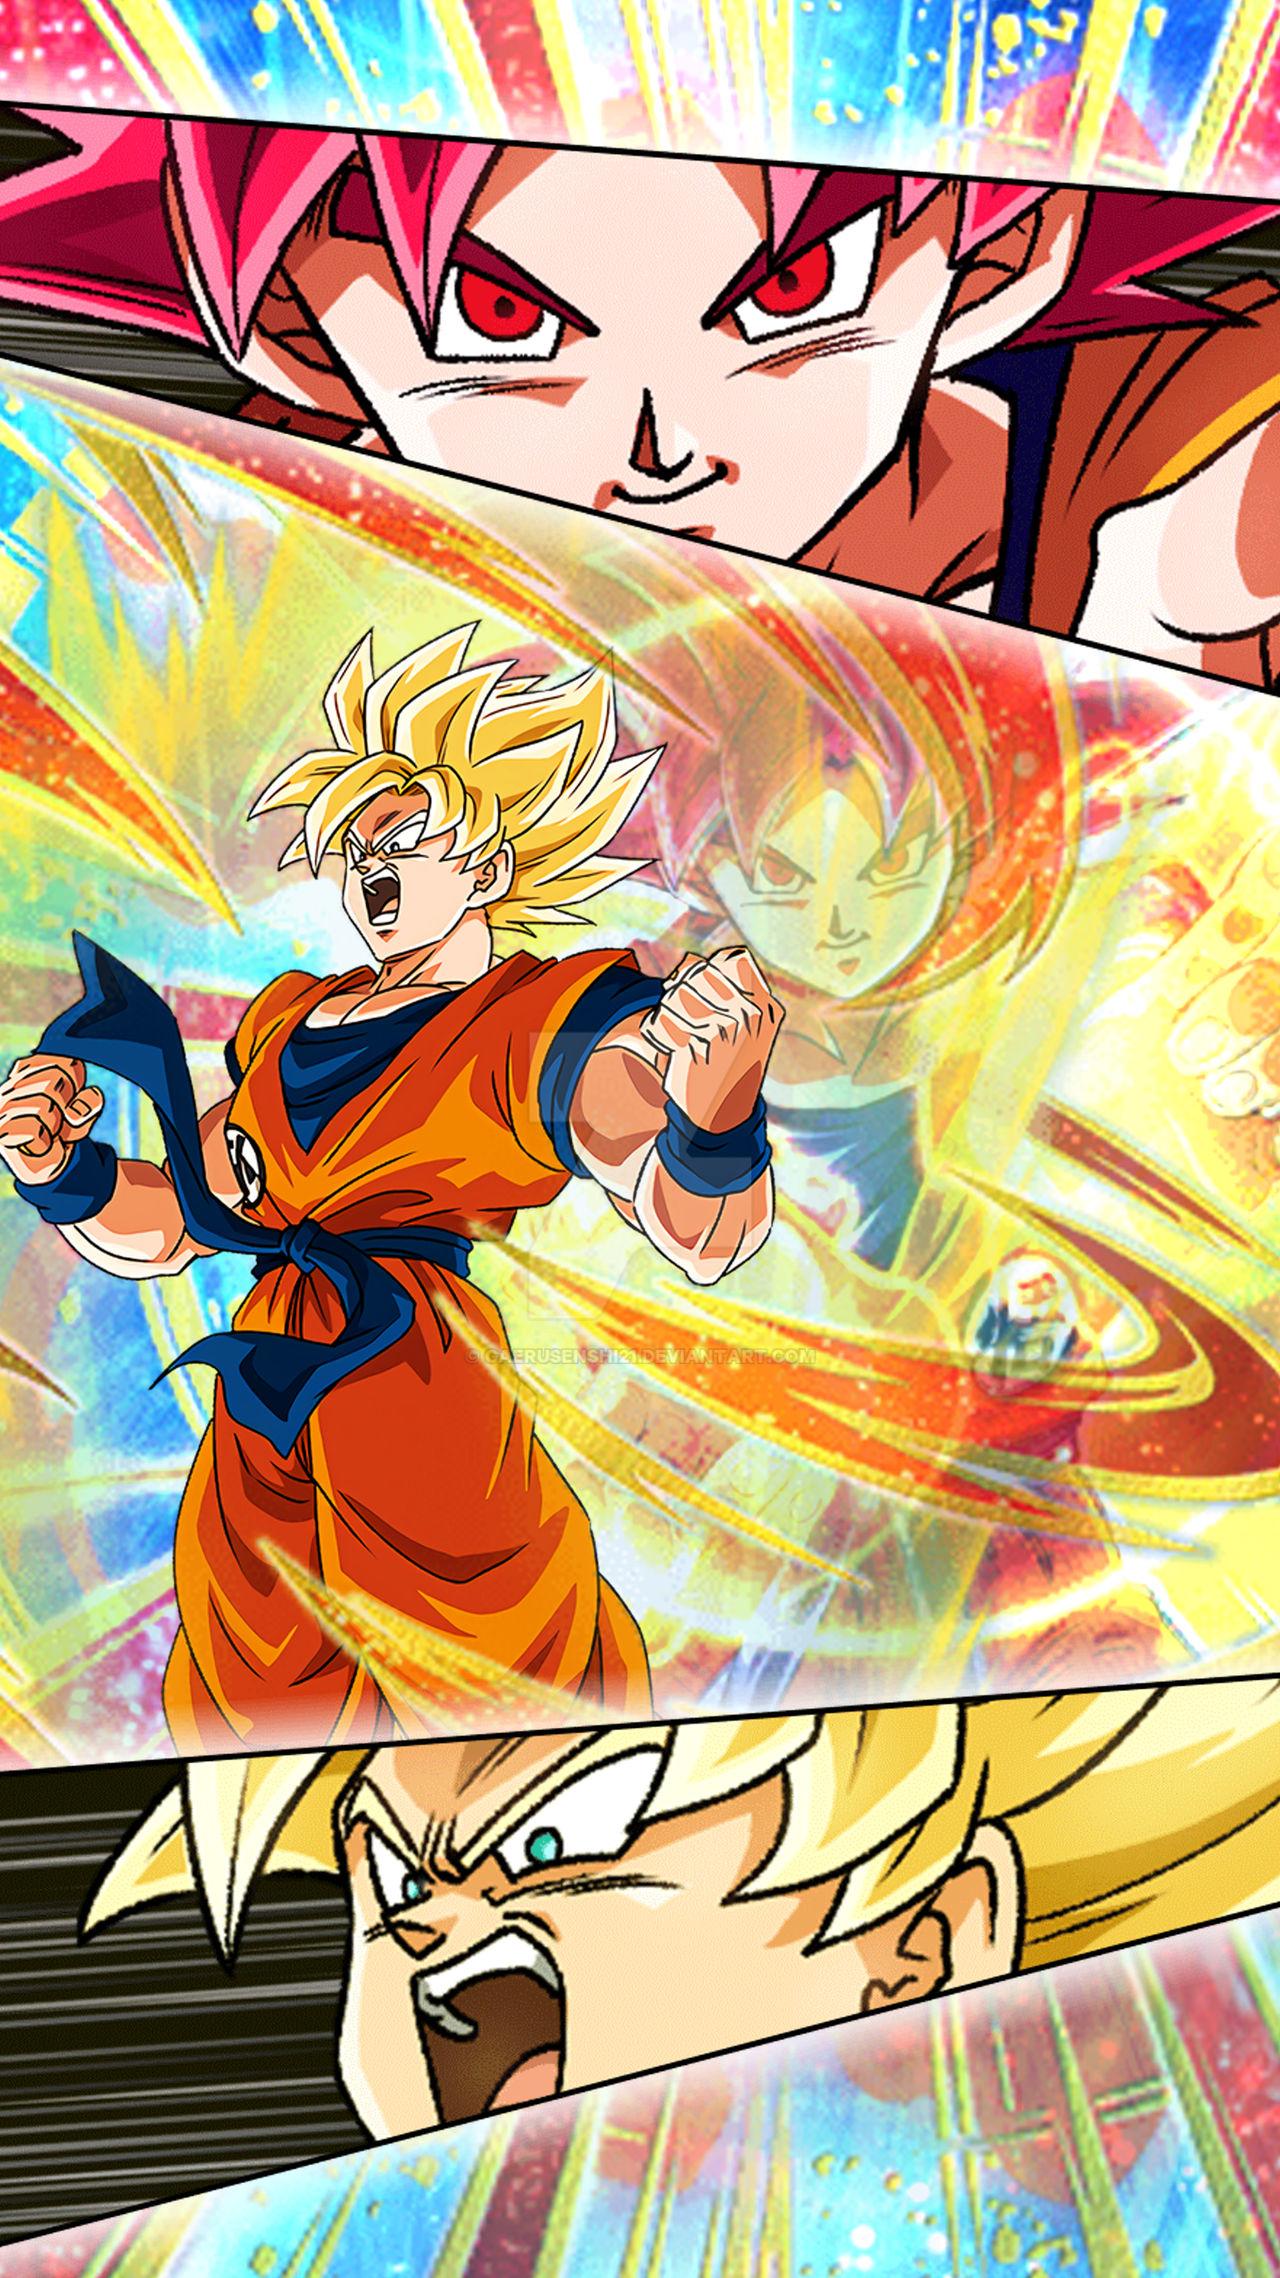 Wallpaper Goku Dragon Ball Z Dokkan Battle 4 By Gaerusenshi21 On